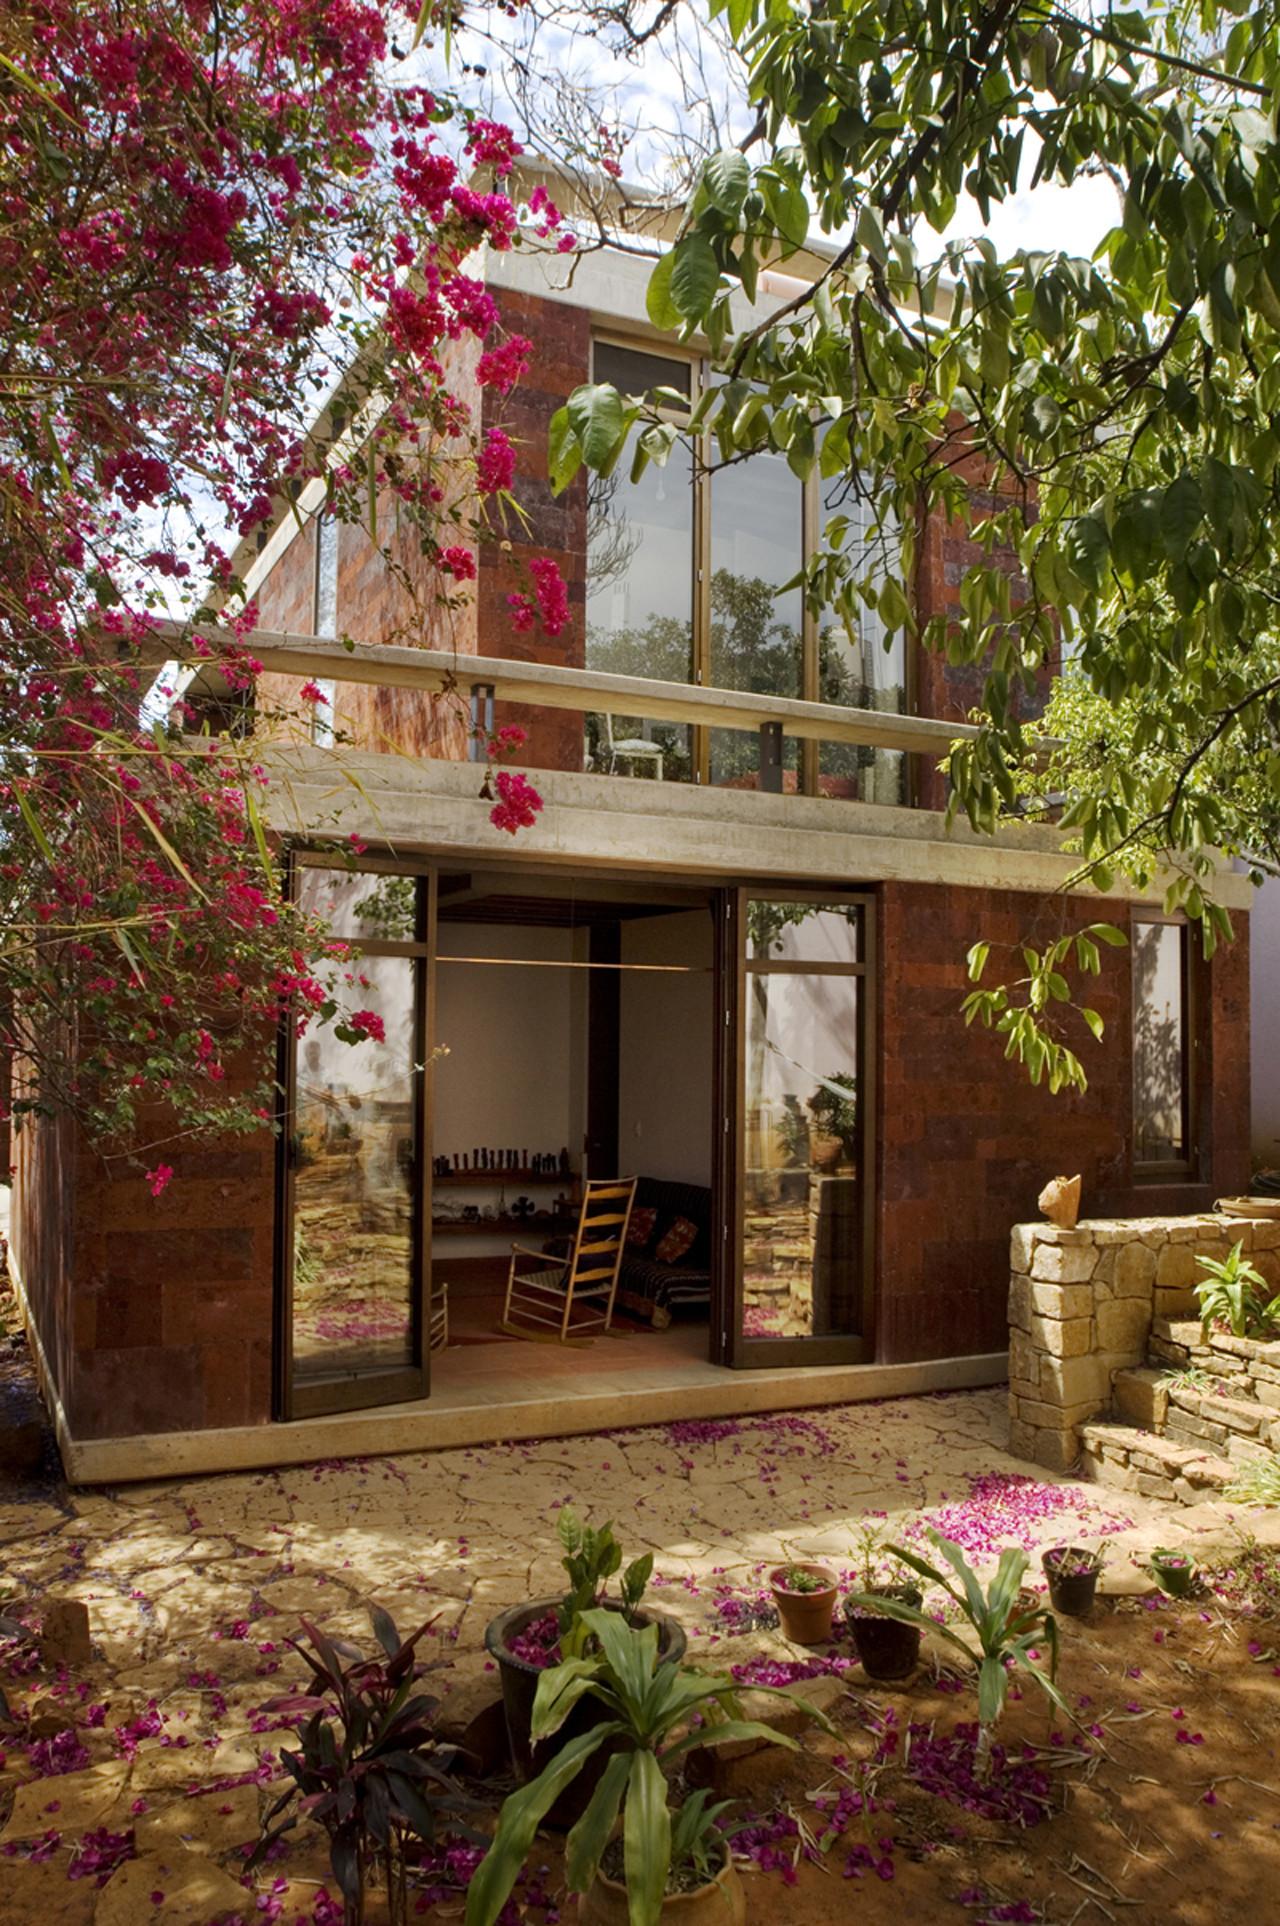 Casa-Estudio Oaxaca / Taller de Arquitectura-Mauricio Rocha, © Jaime Navarro